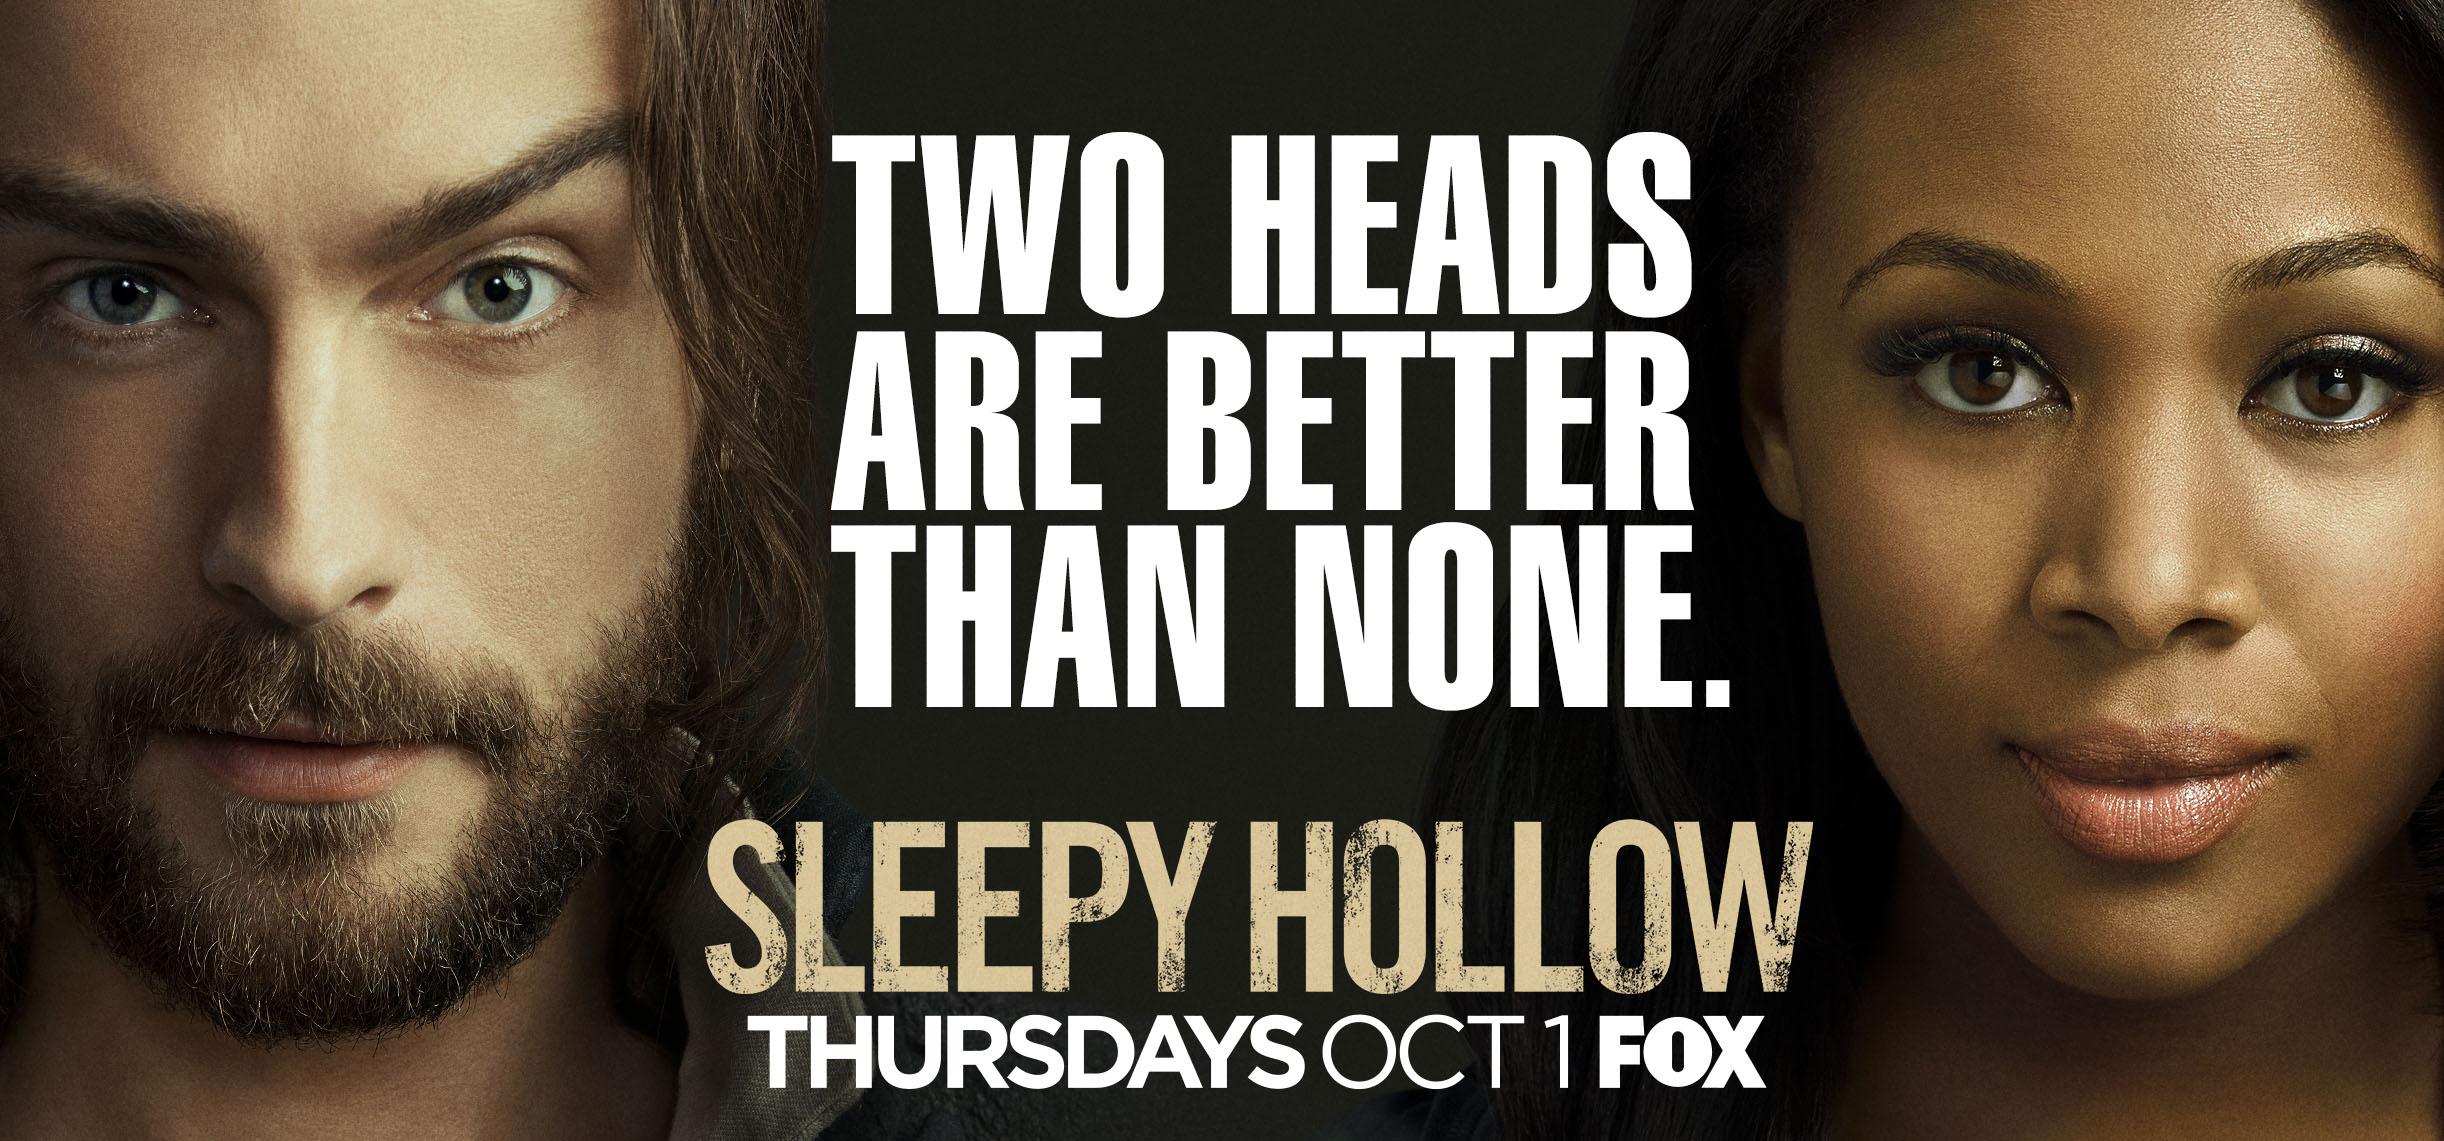 SleepyHollow_Season3_Poster